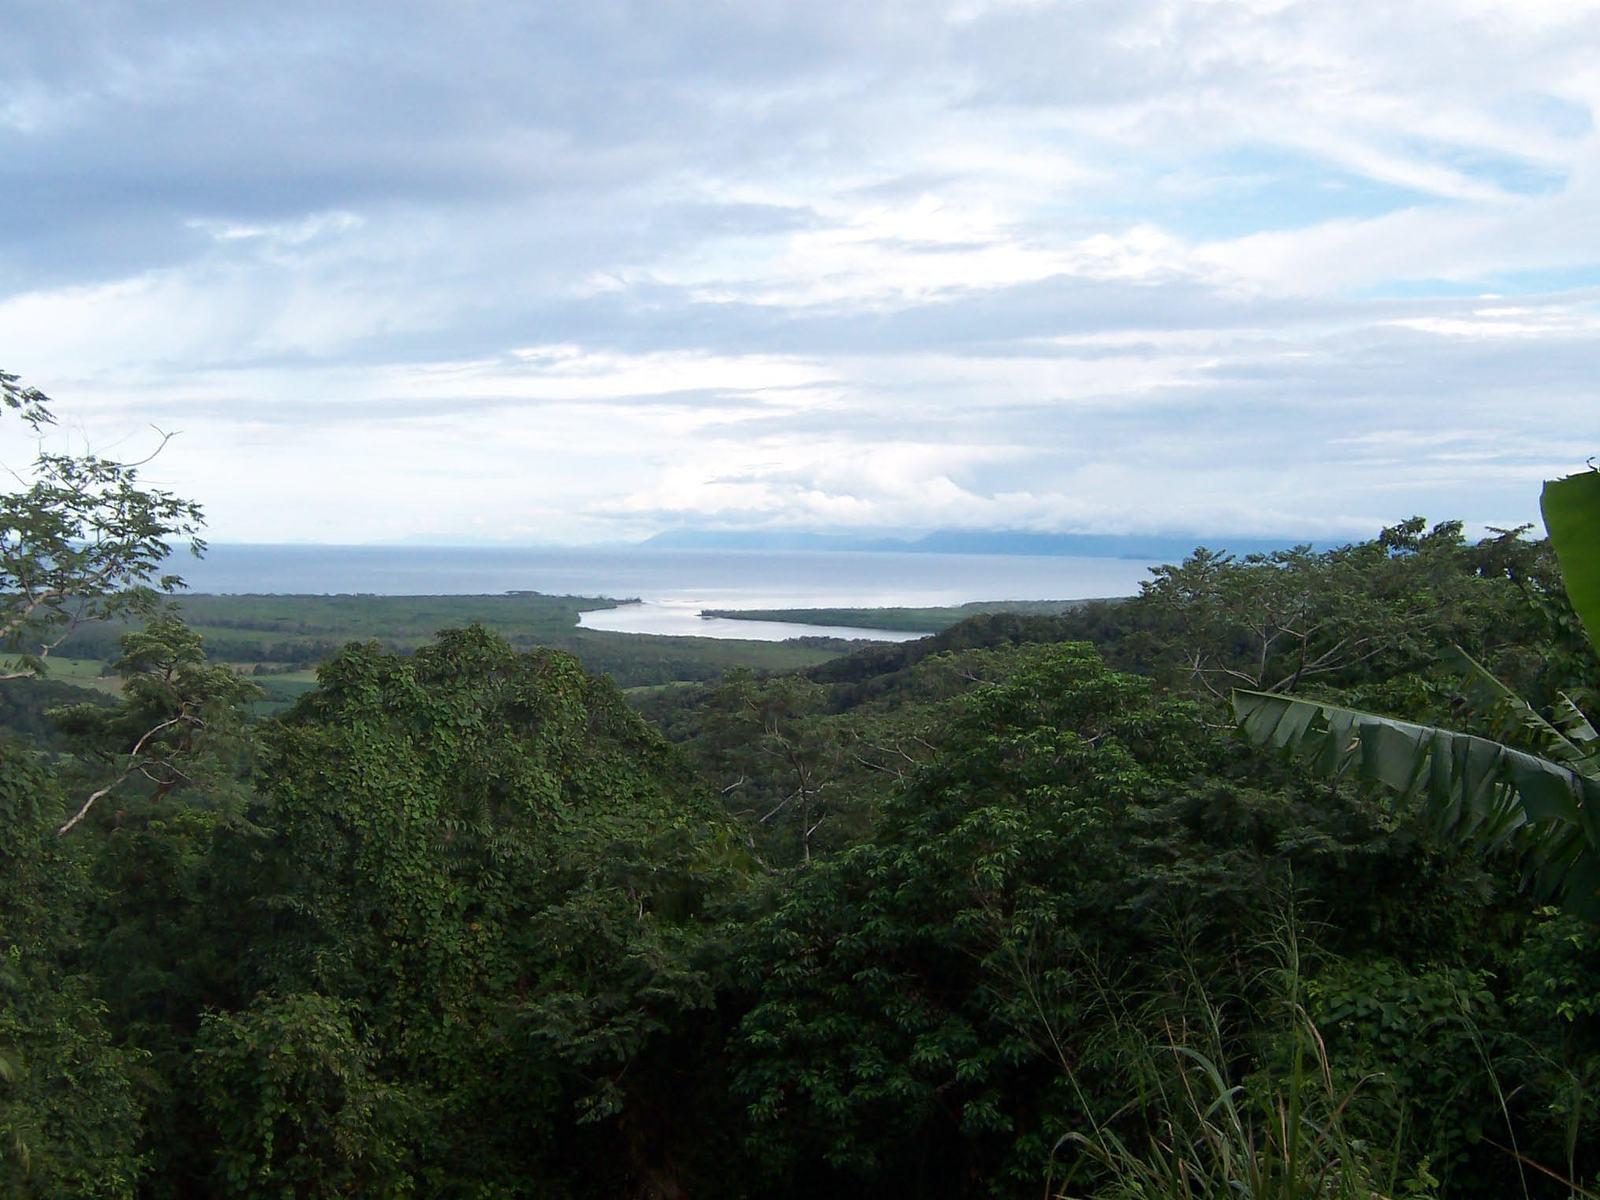 daintree river